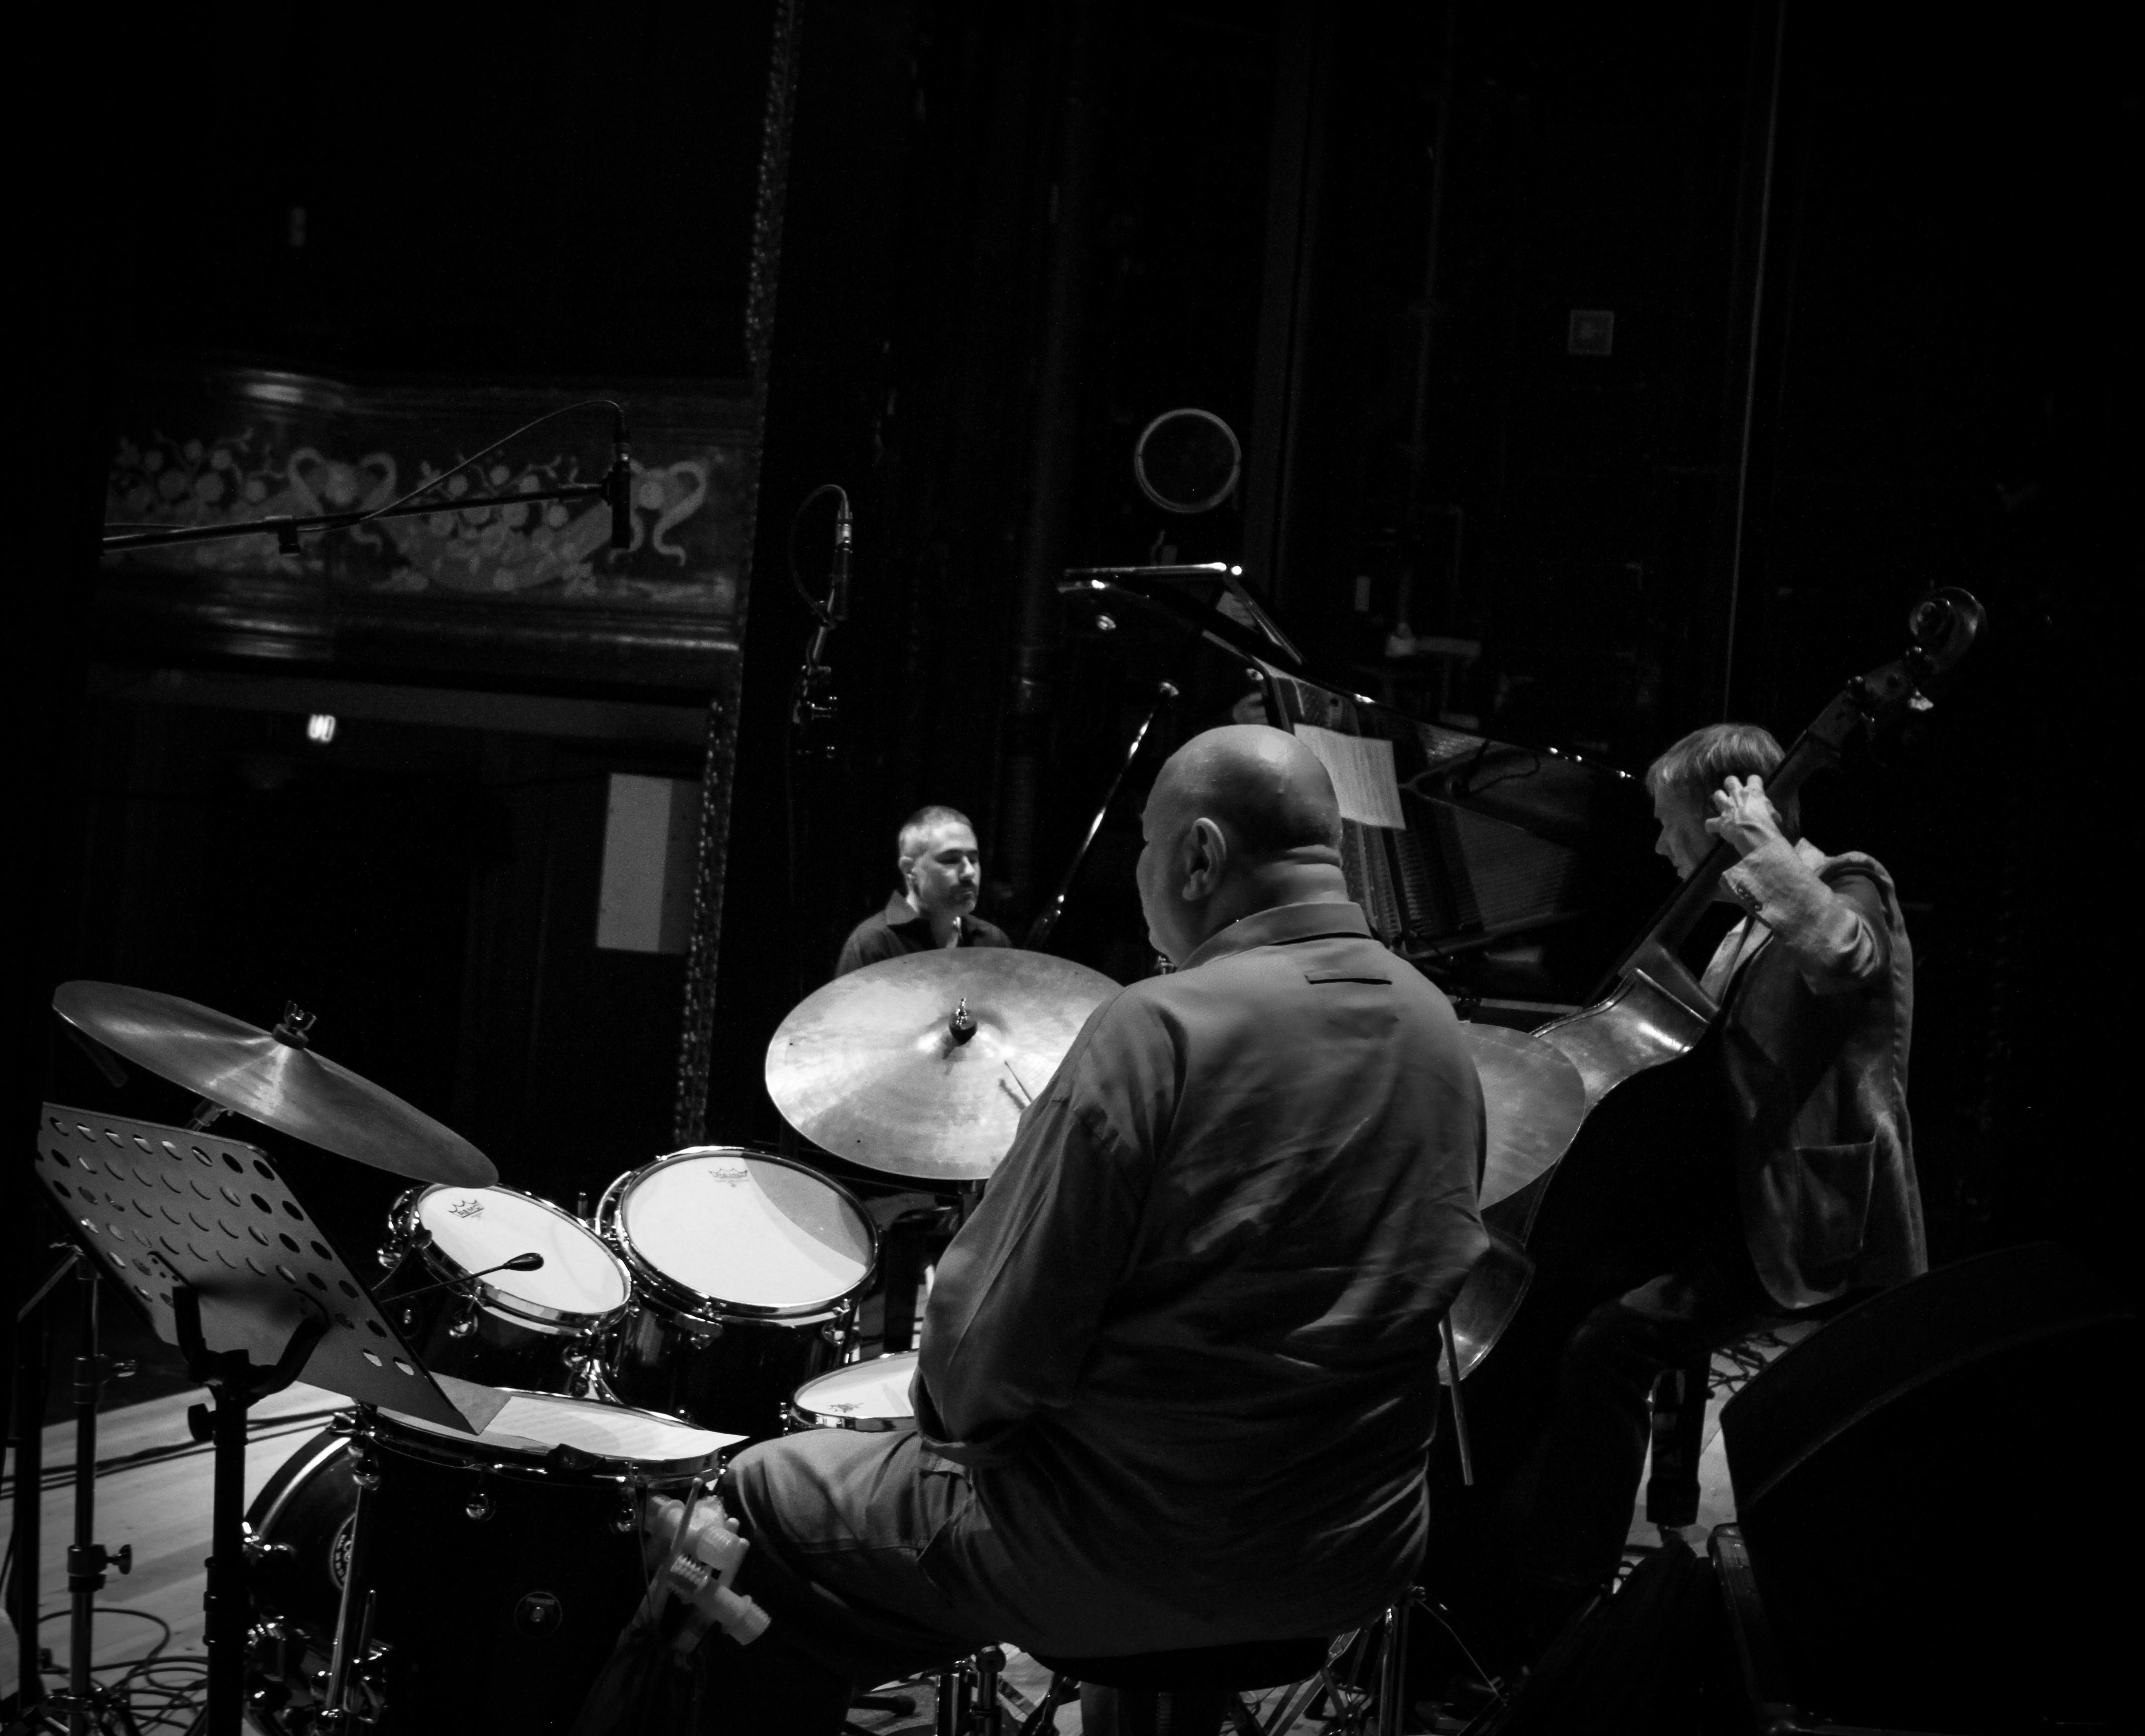 Jean-Michel Pilc (Pia) Daniel Humair (Drums) Mads Vinding (Bass) at Summer Jazz 2014 in Copenhagen, Denmark